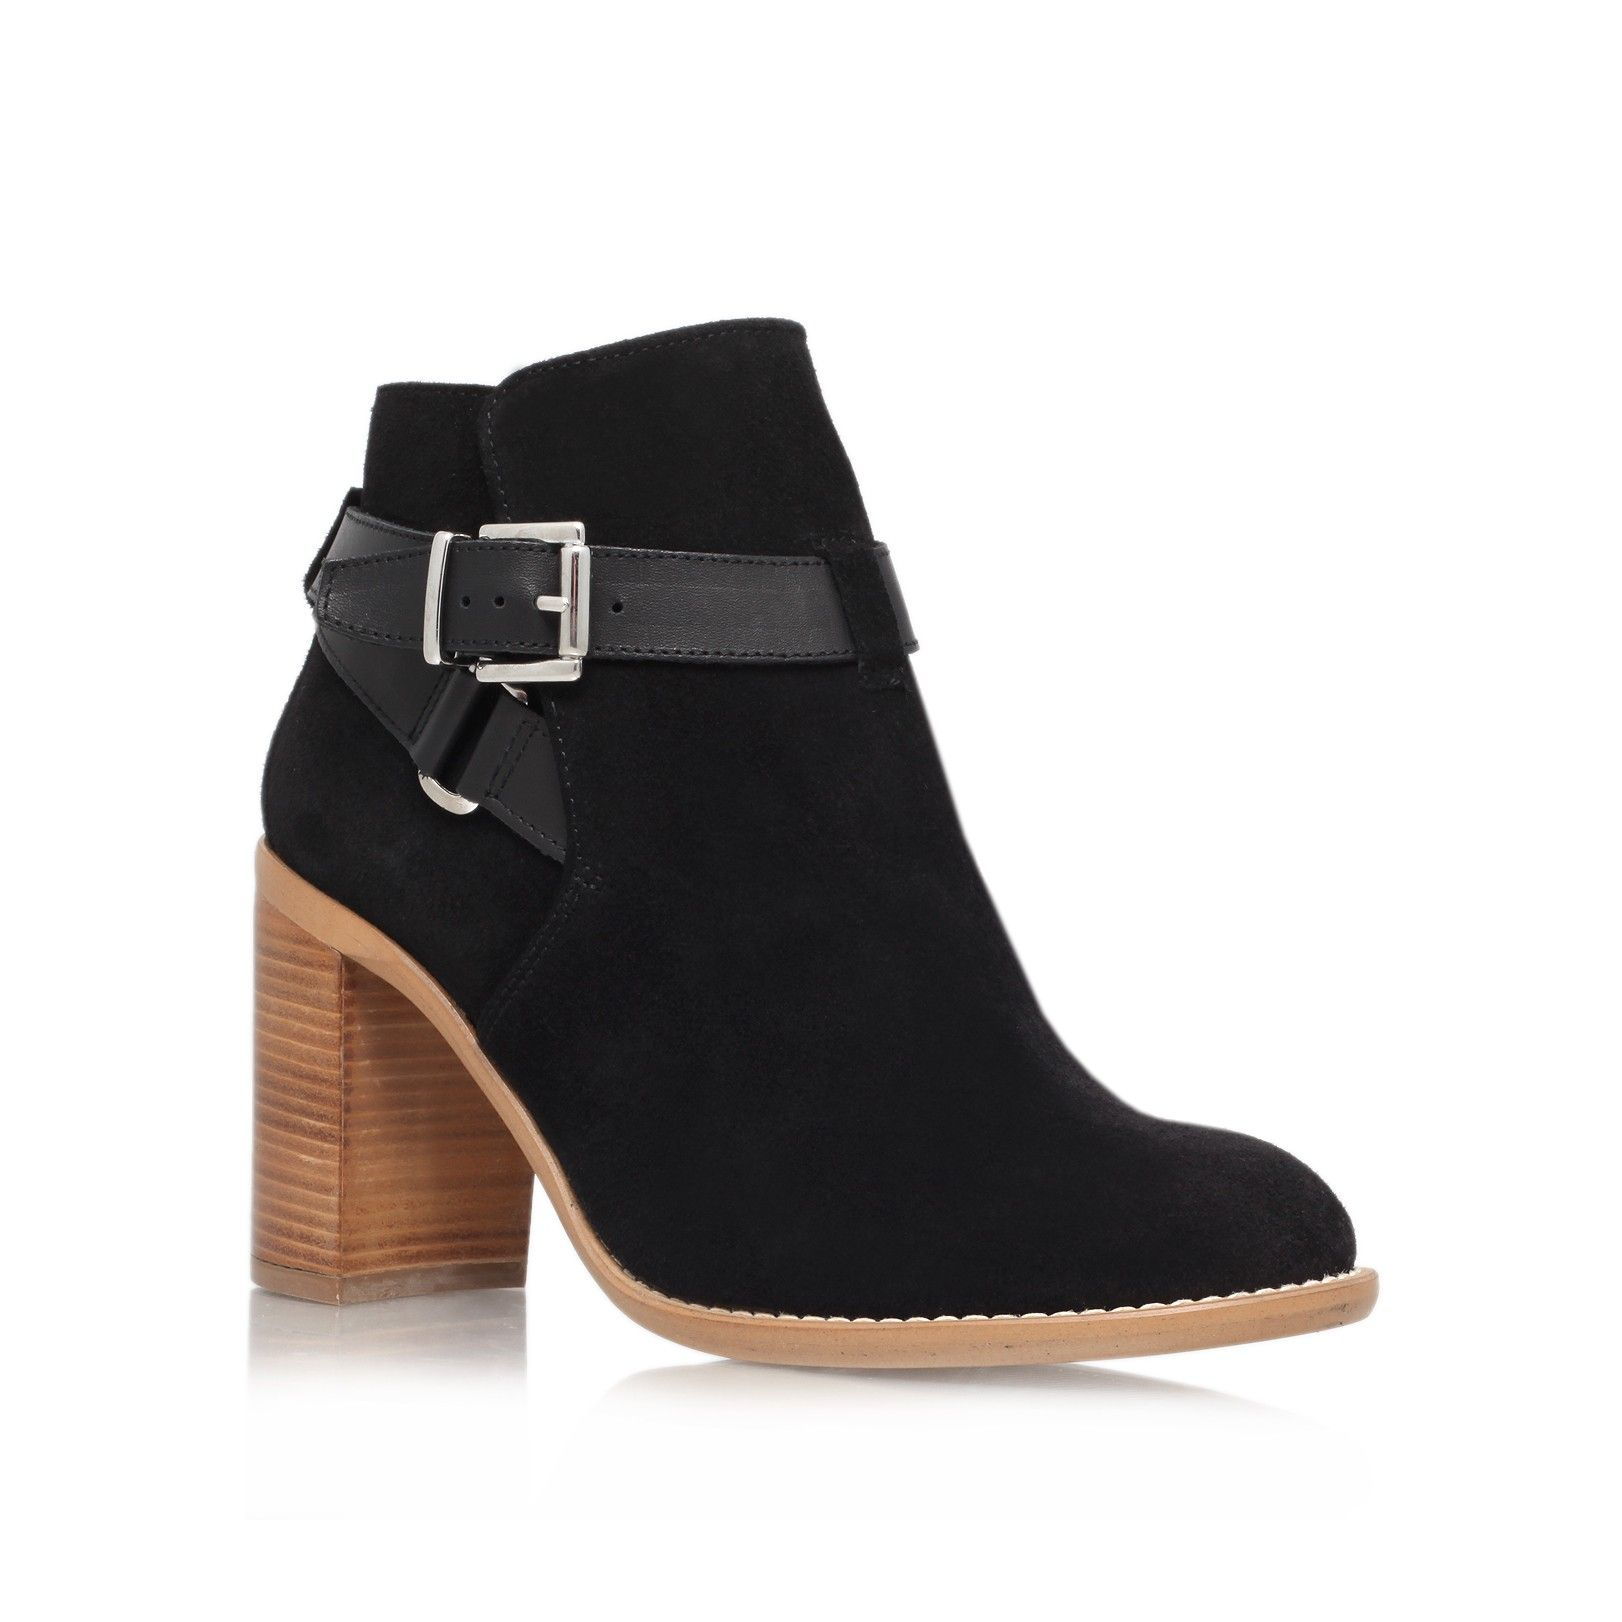 2016 Hot Sale Kg By Kurt Geiger Sebastien Block Heeled Ankle Boots Women Wine Leather HMJHF92